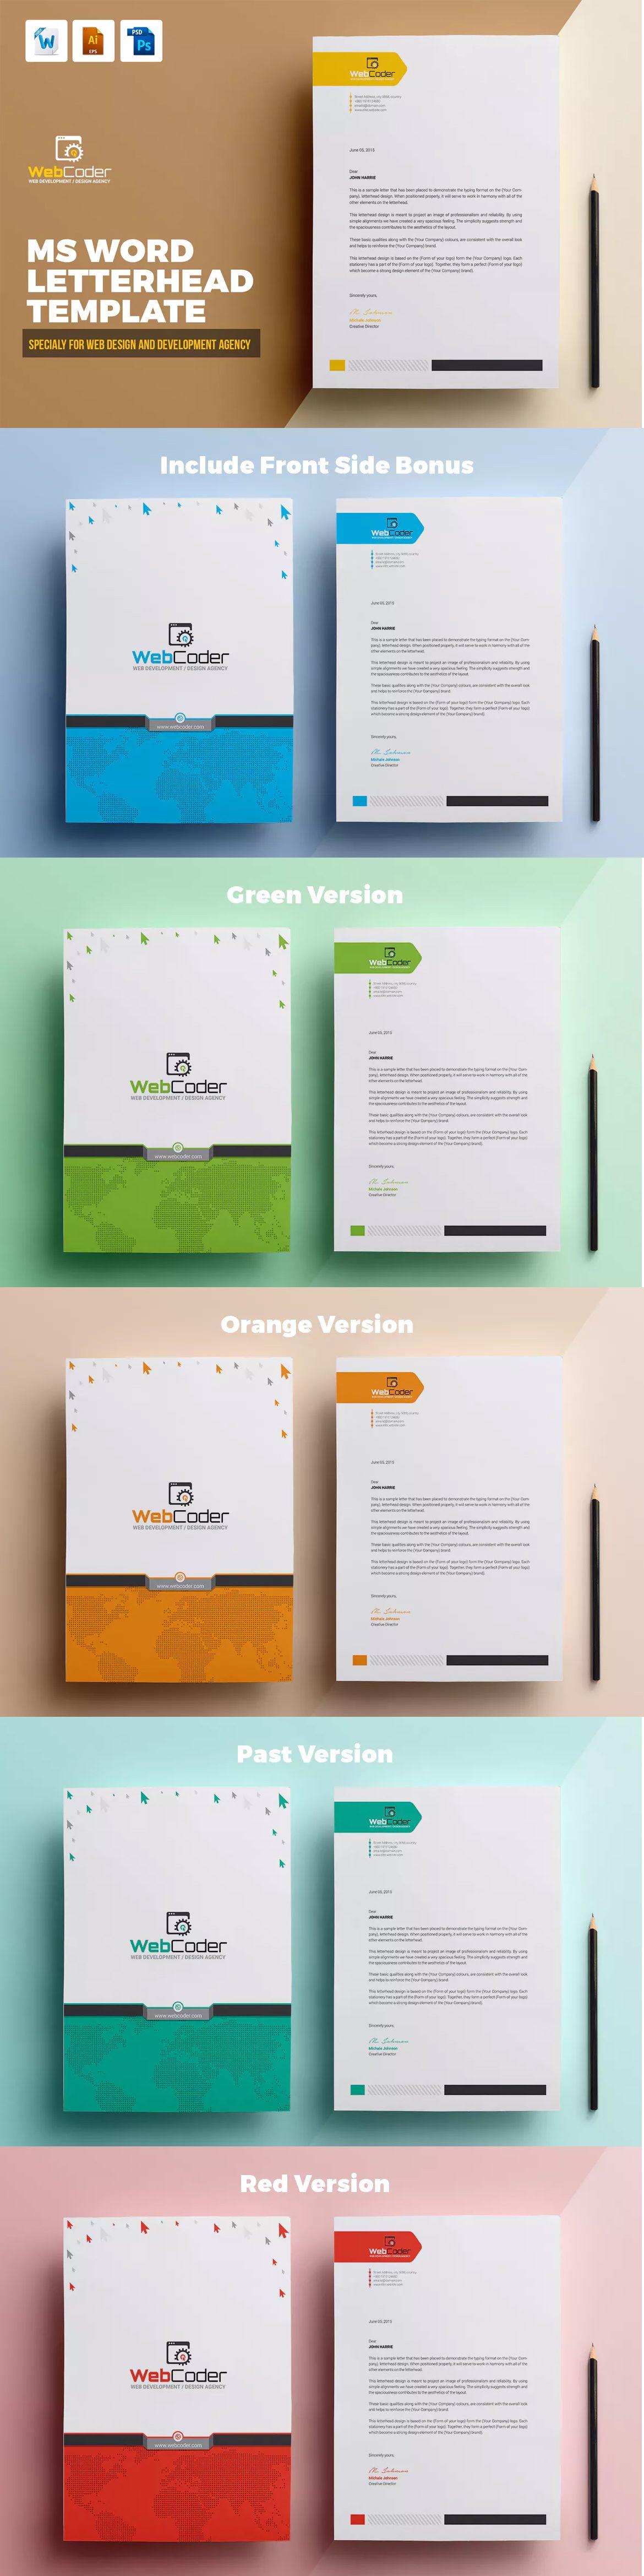 web design agency ms word letterhead web coder ai eps psd a4